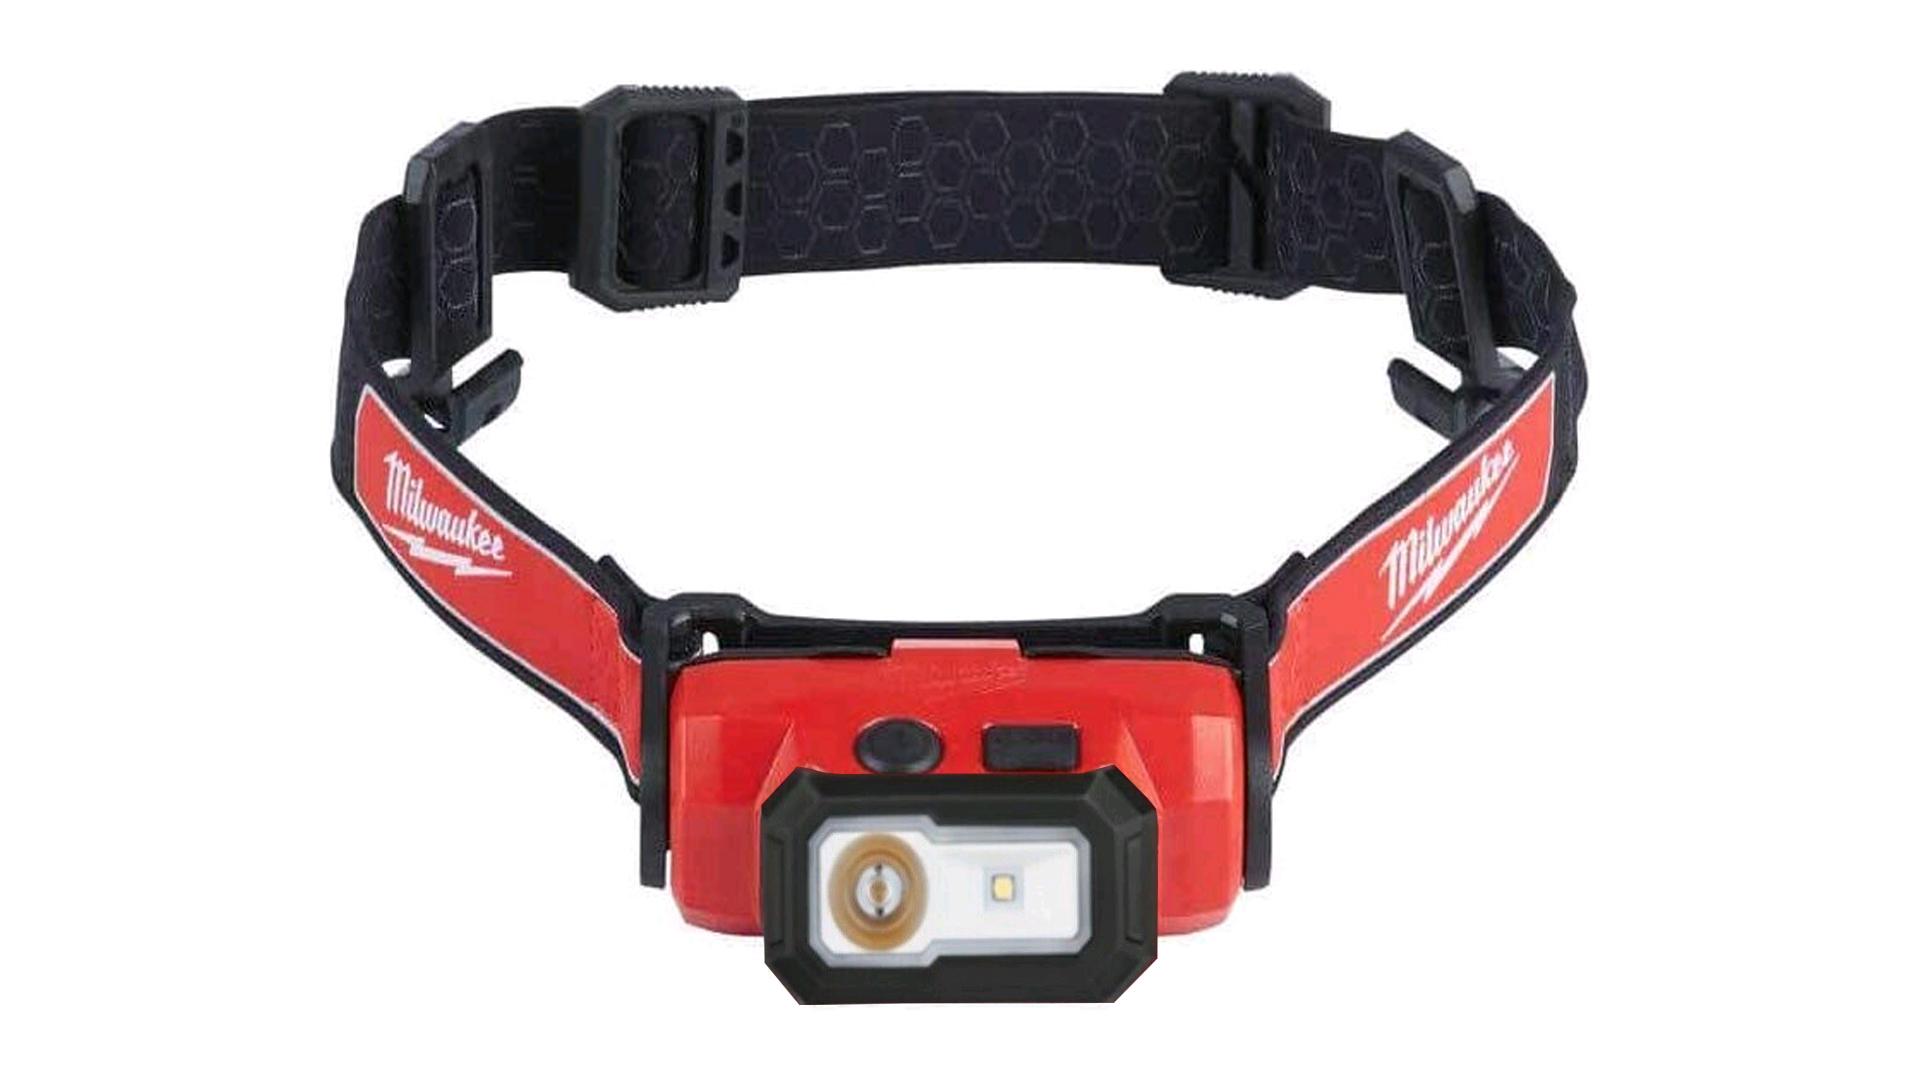 Milwaukee L4HL-VIS Headlamp Usb Rechargeable Hi-Vis 4933471389